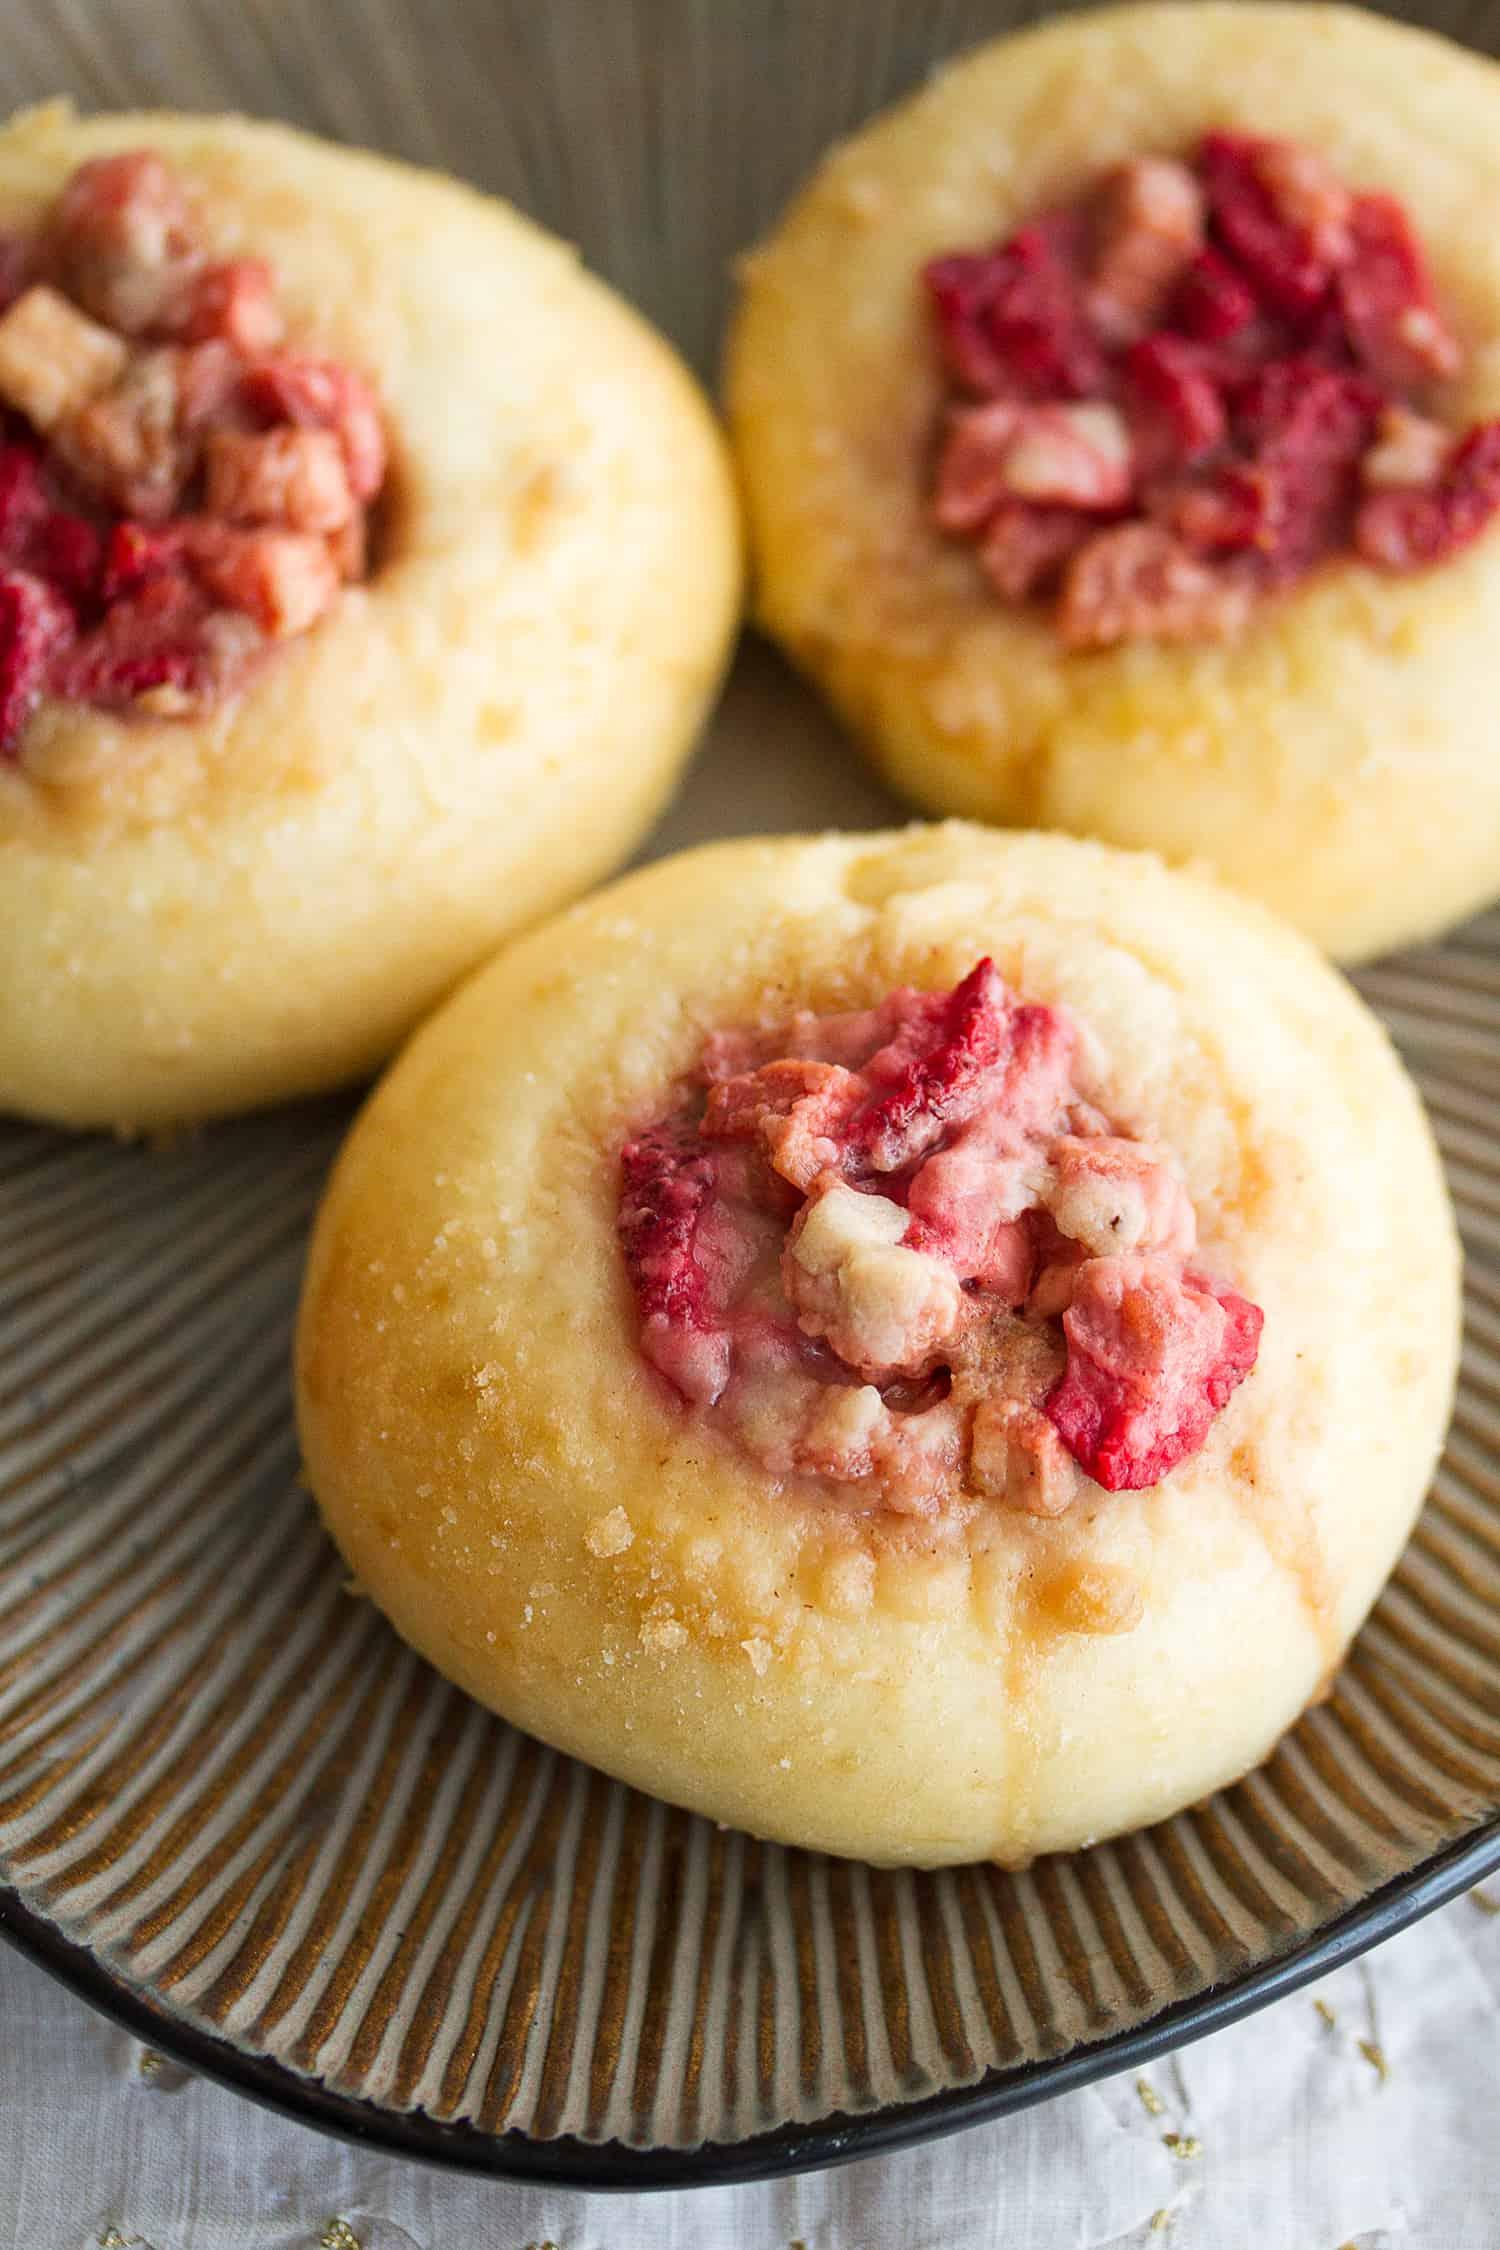 Berried Treasures: Strawberry Rhubarb Streusel Buns